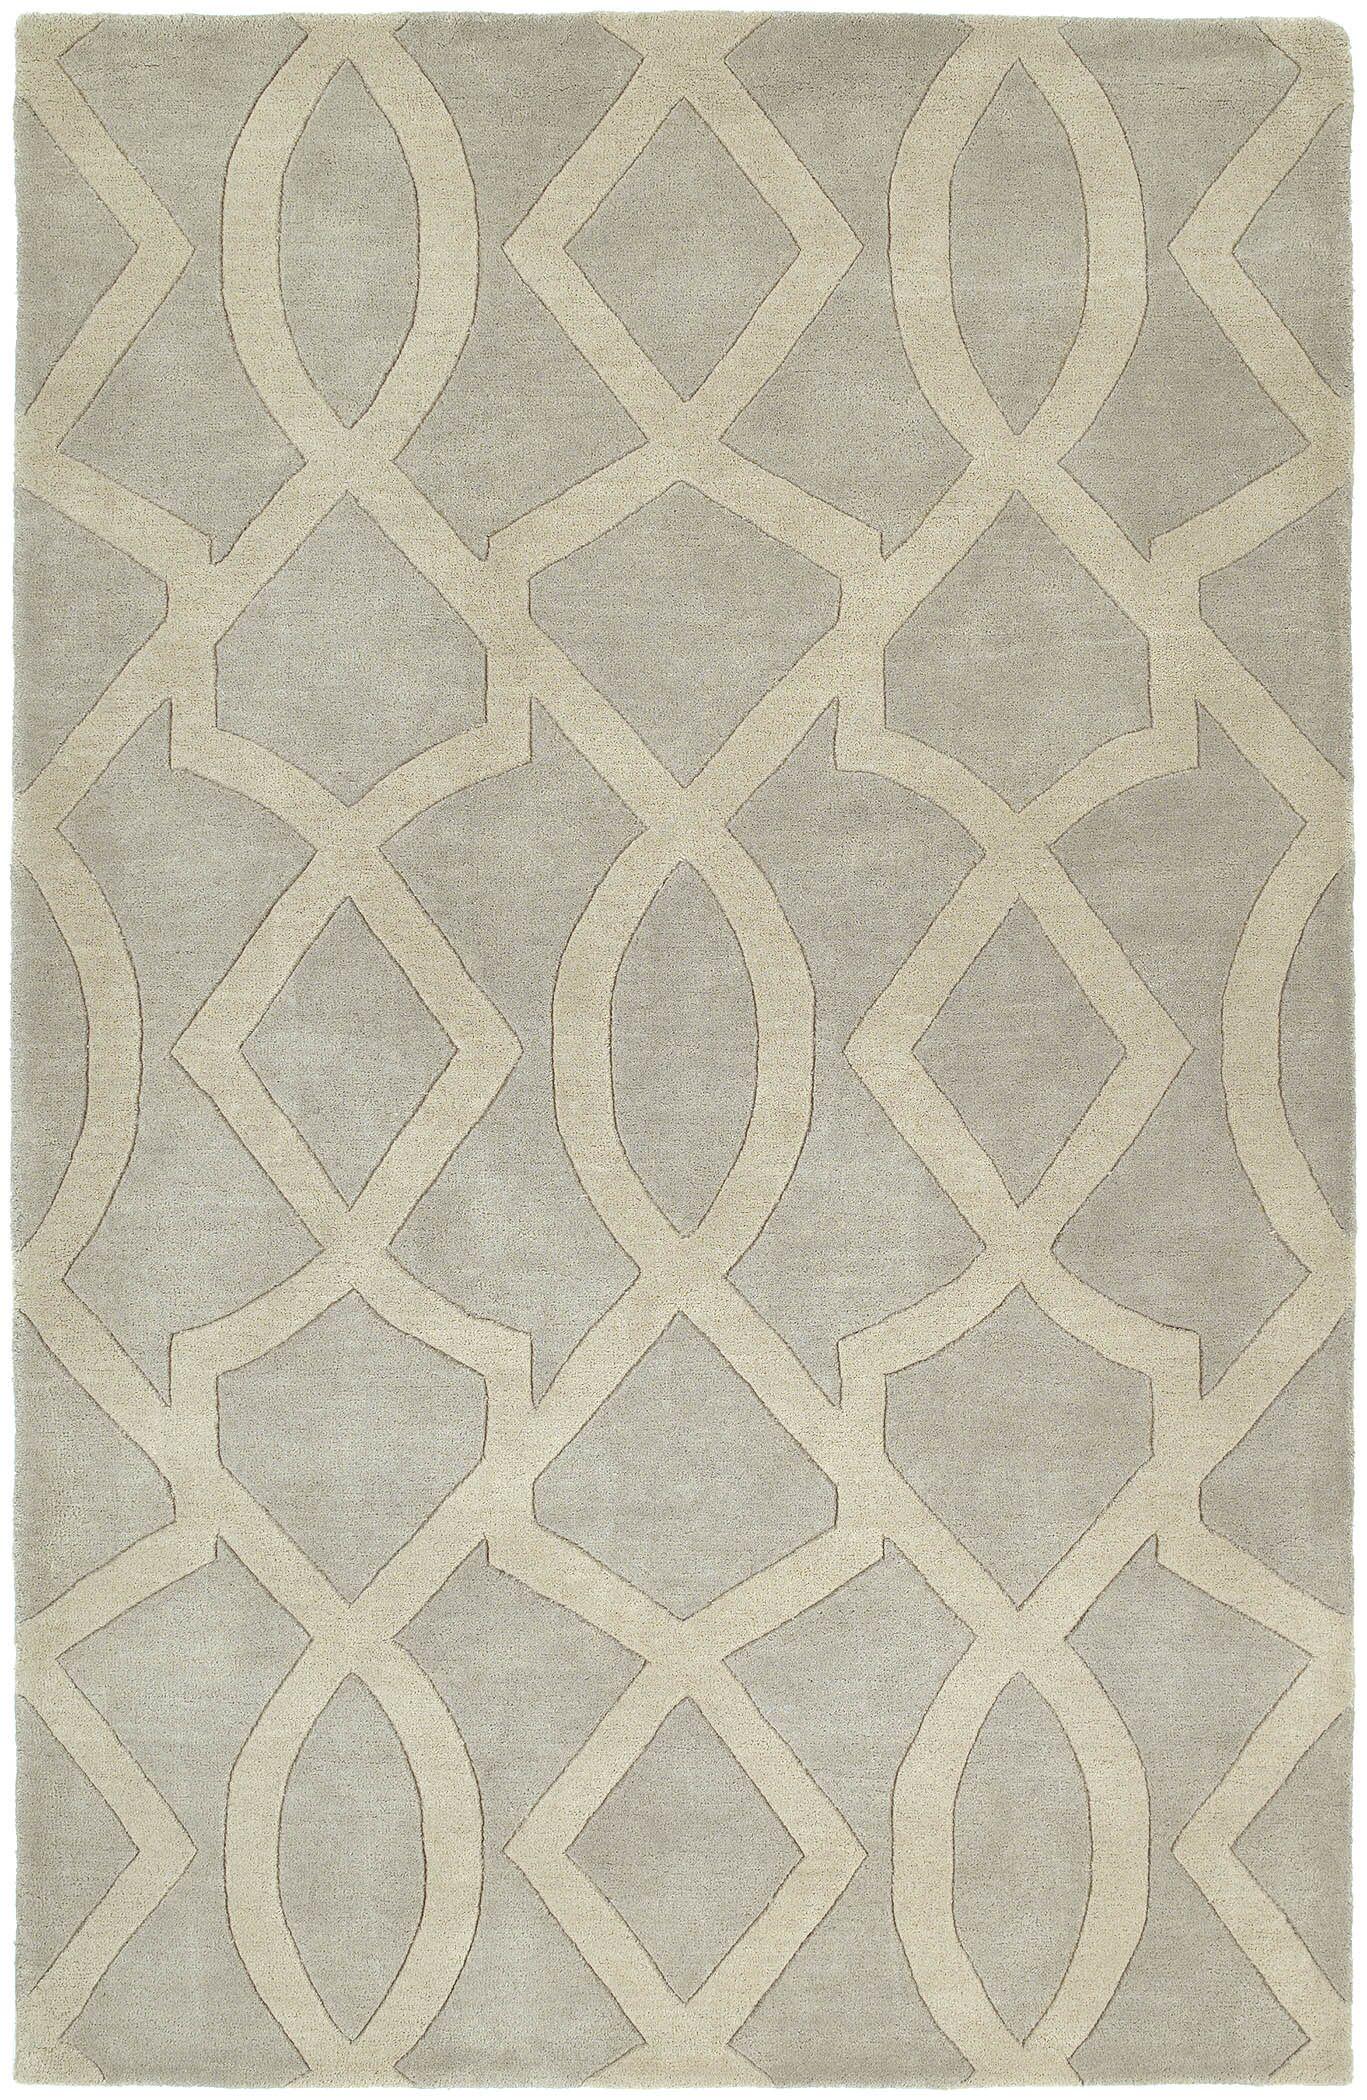 Brooks Hand-Tufted Ivory/Gray Area Rug Rug Size: Rectangle 3' x 5'